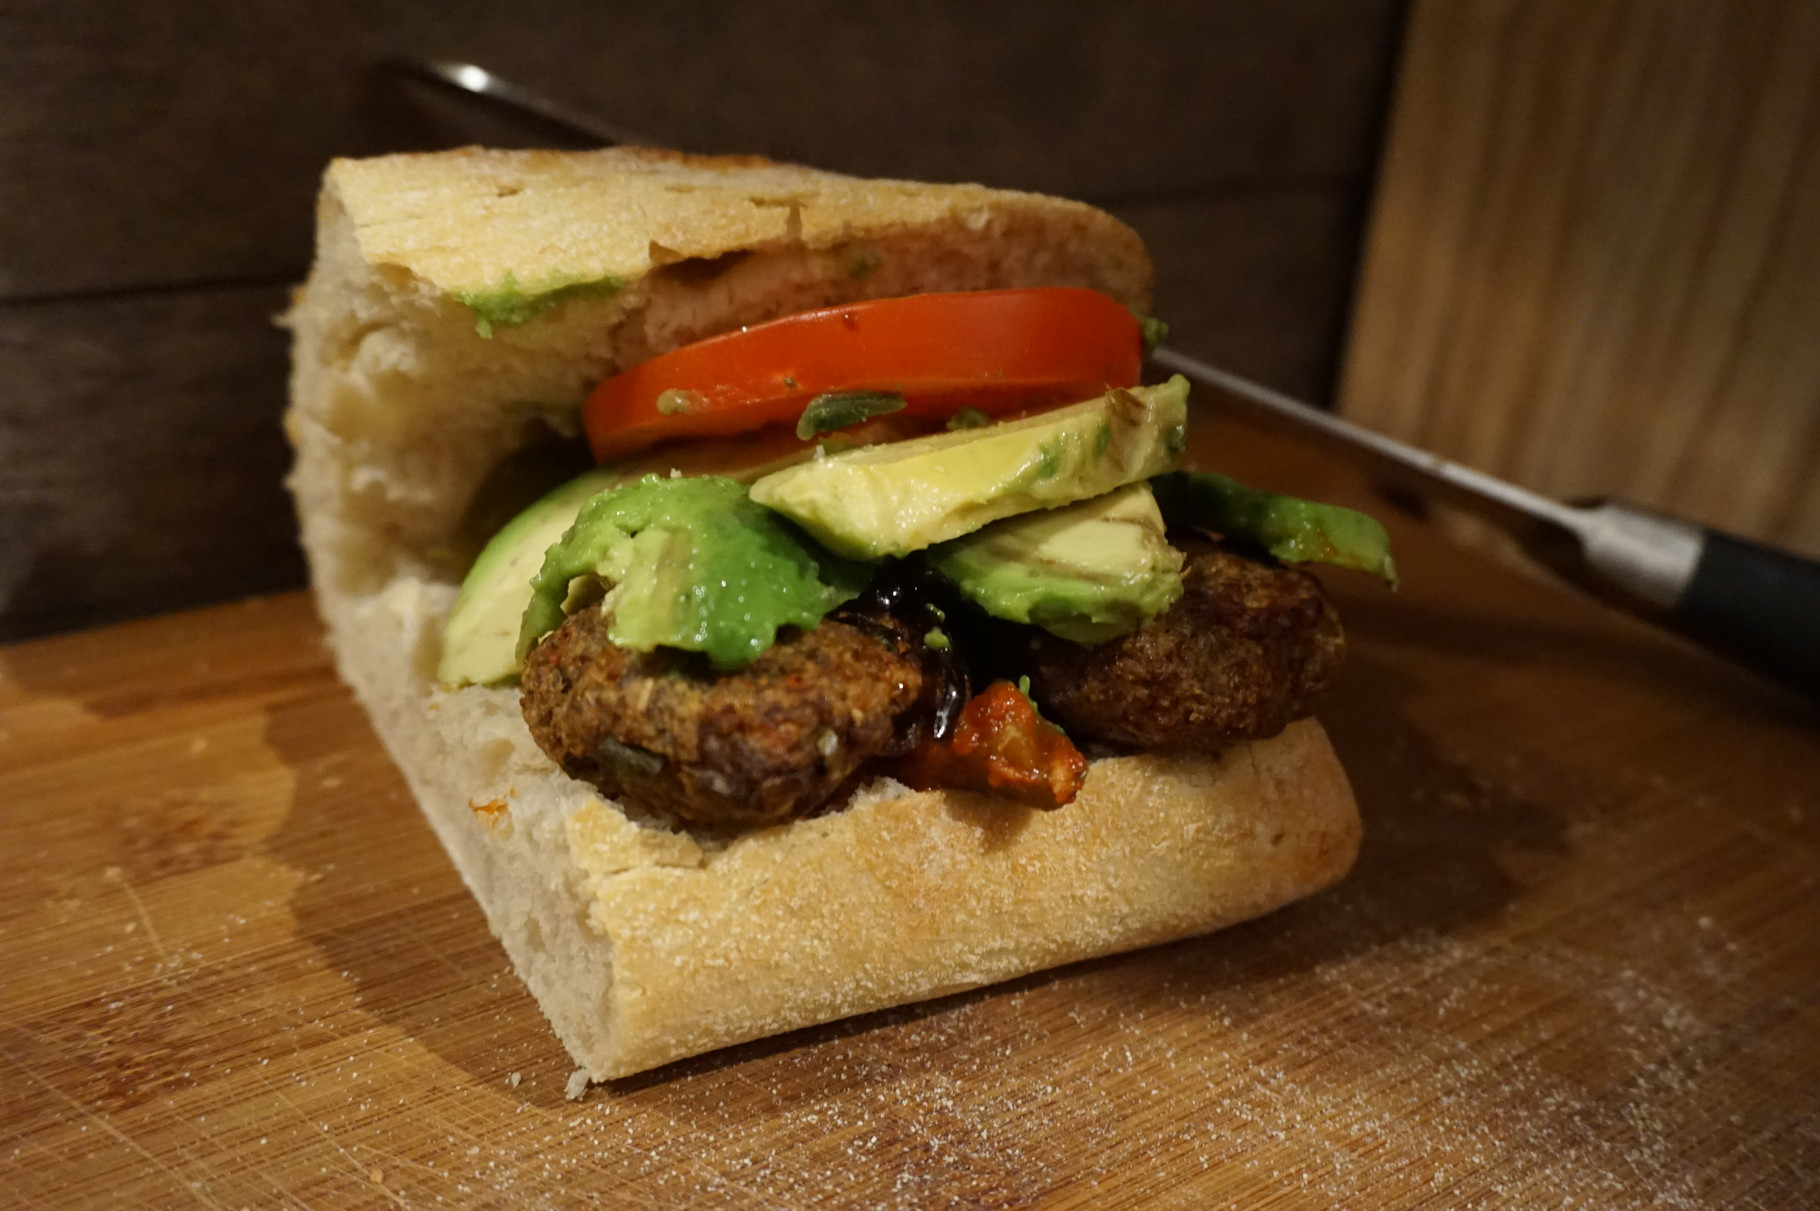 rezept ciabatta k fte buletten burger mit avocado tuerkische rezepte foodblog. Black Bedroom Furniture Sets. Home Design Ideas